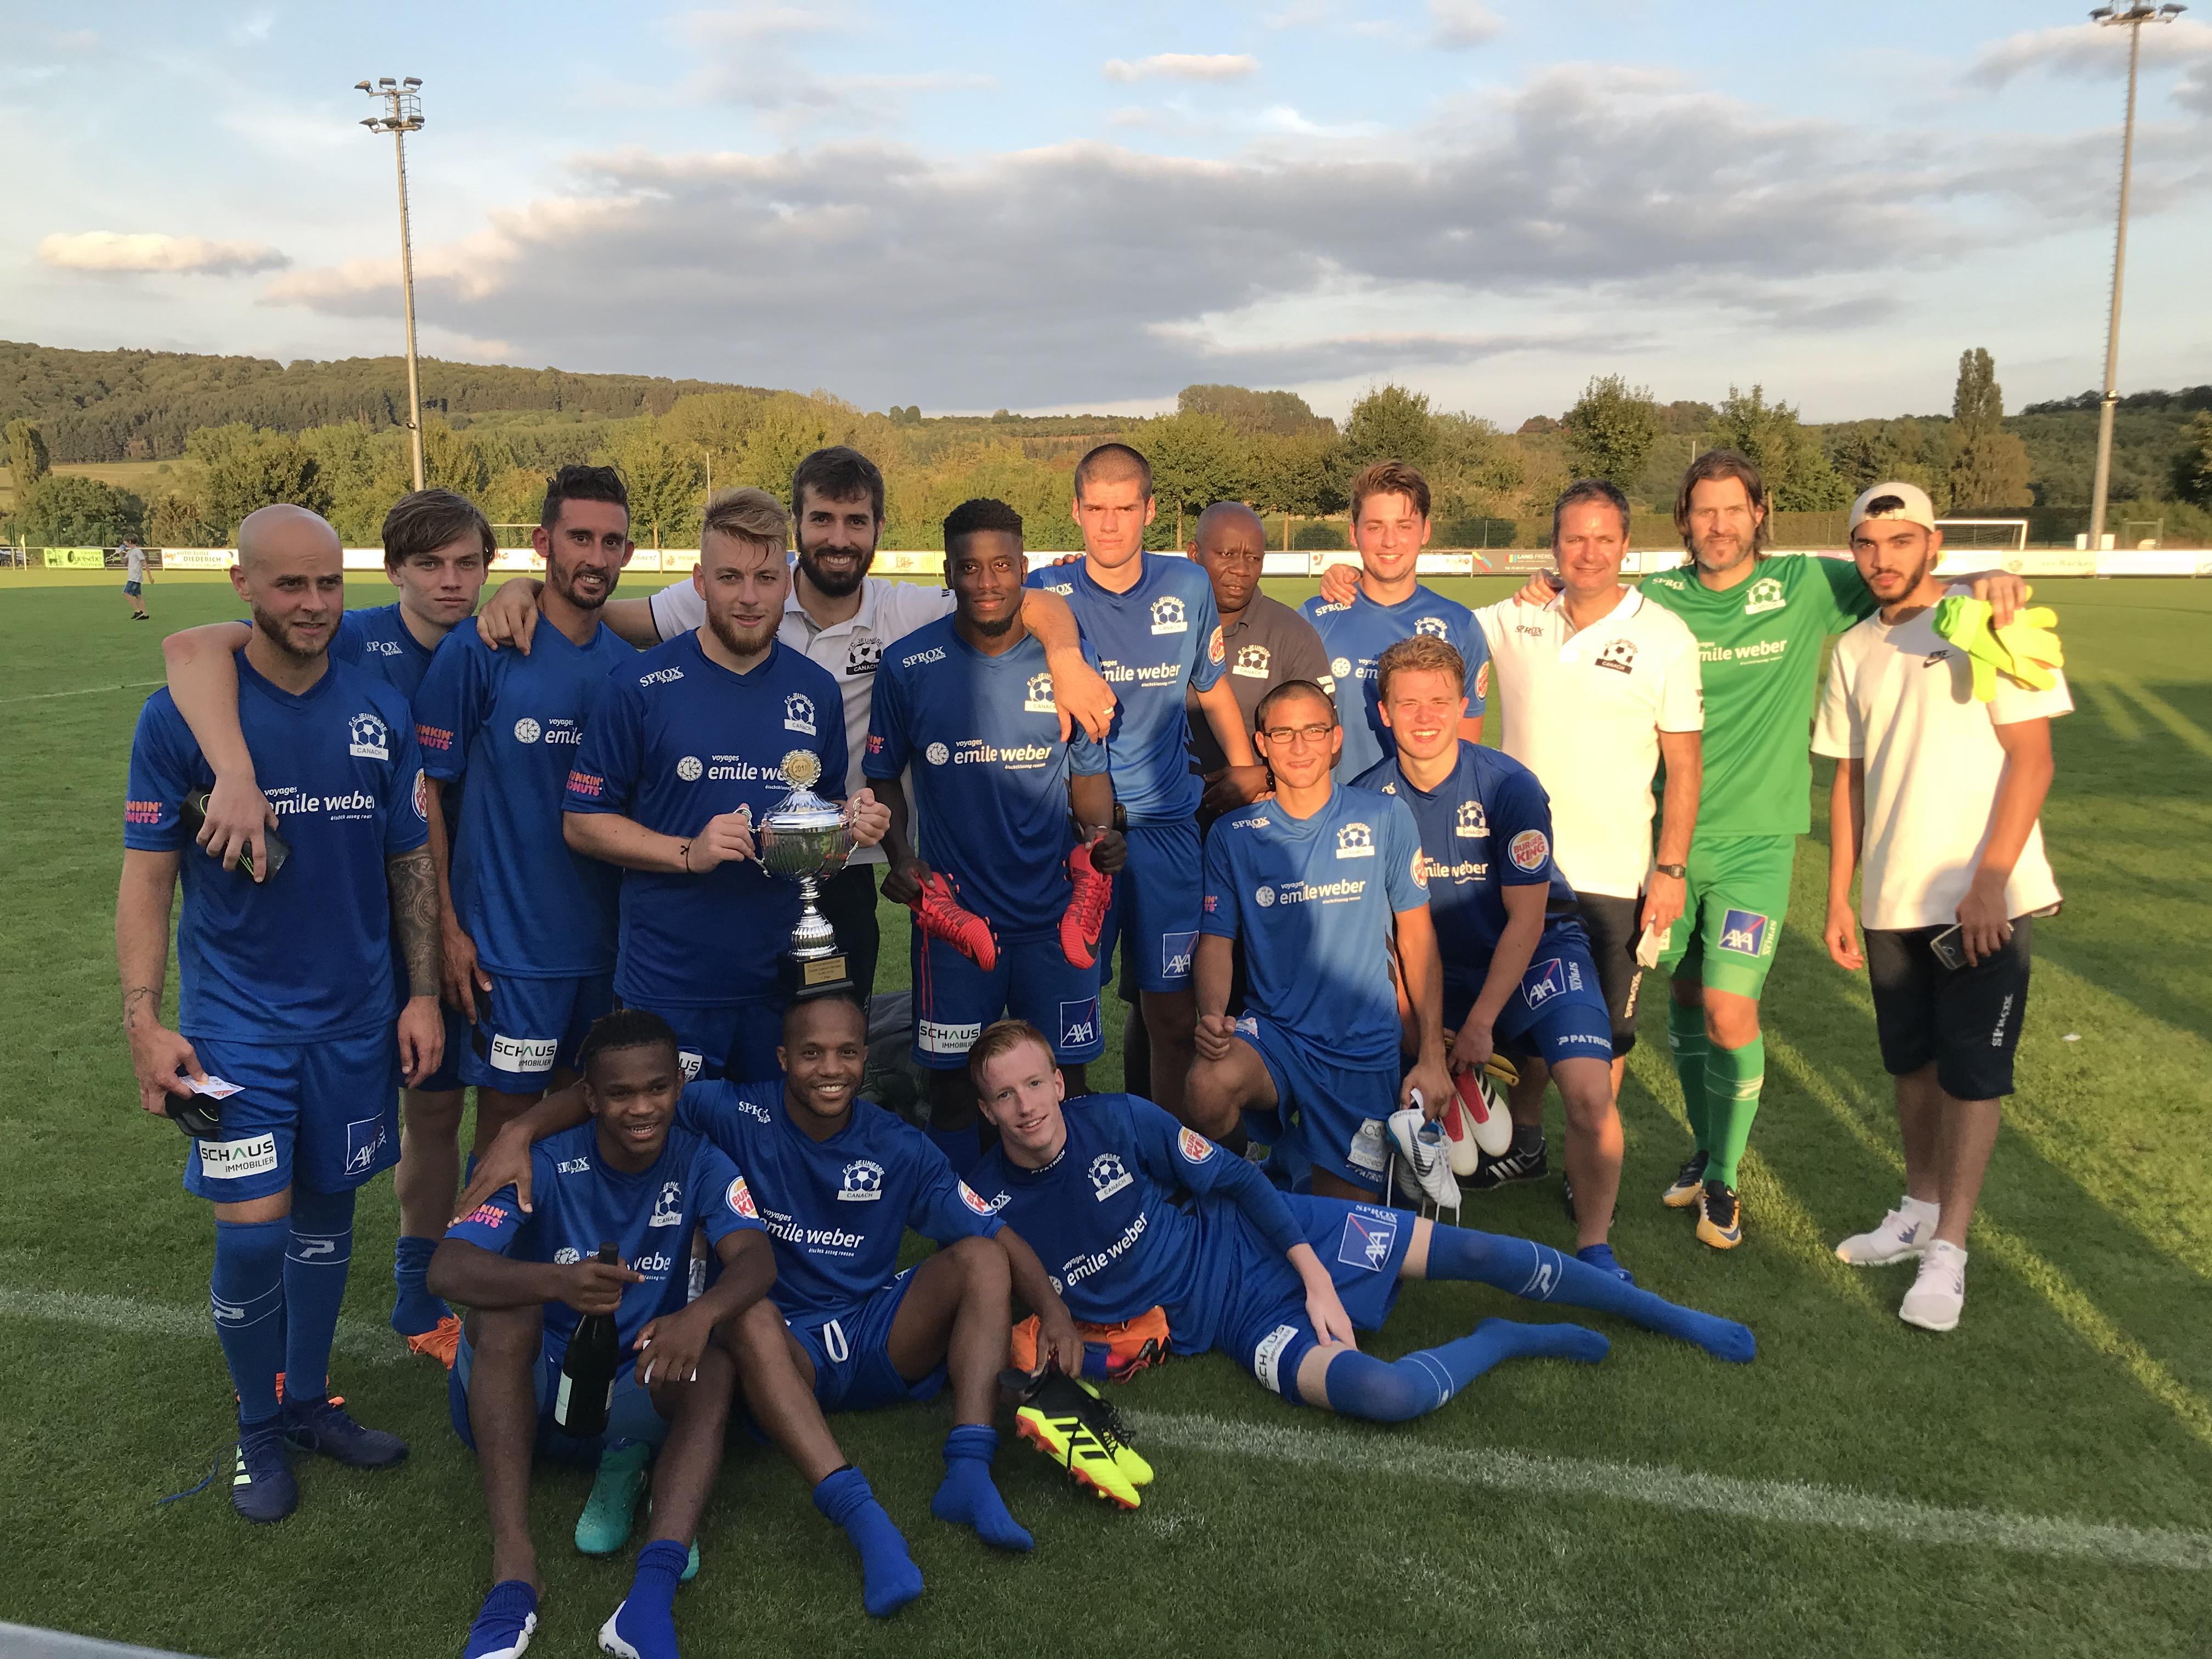 4-1 Victoire zu Monnerech